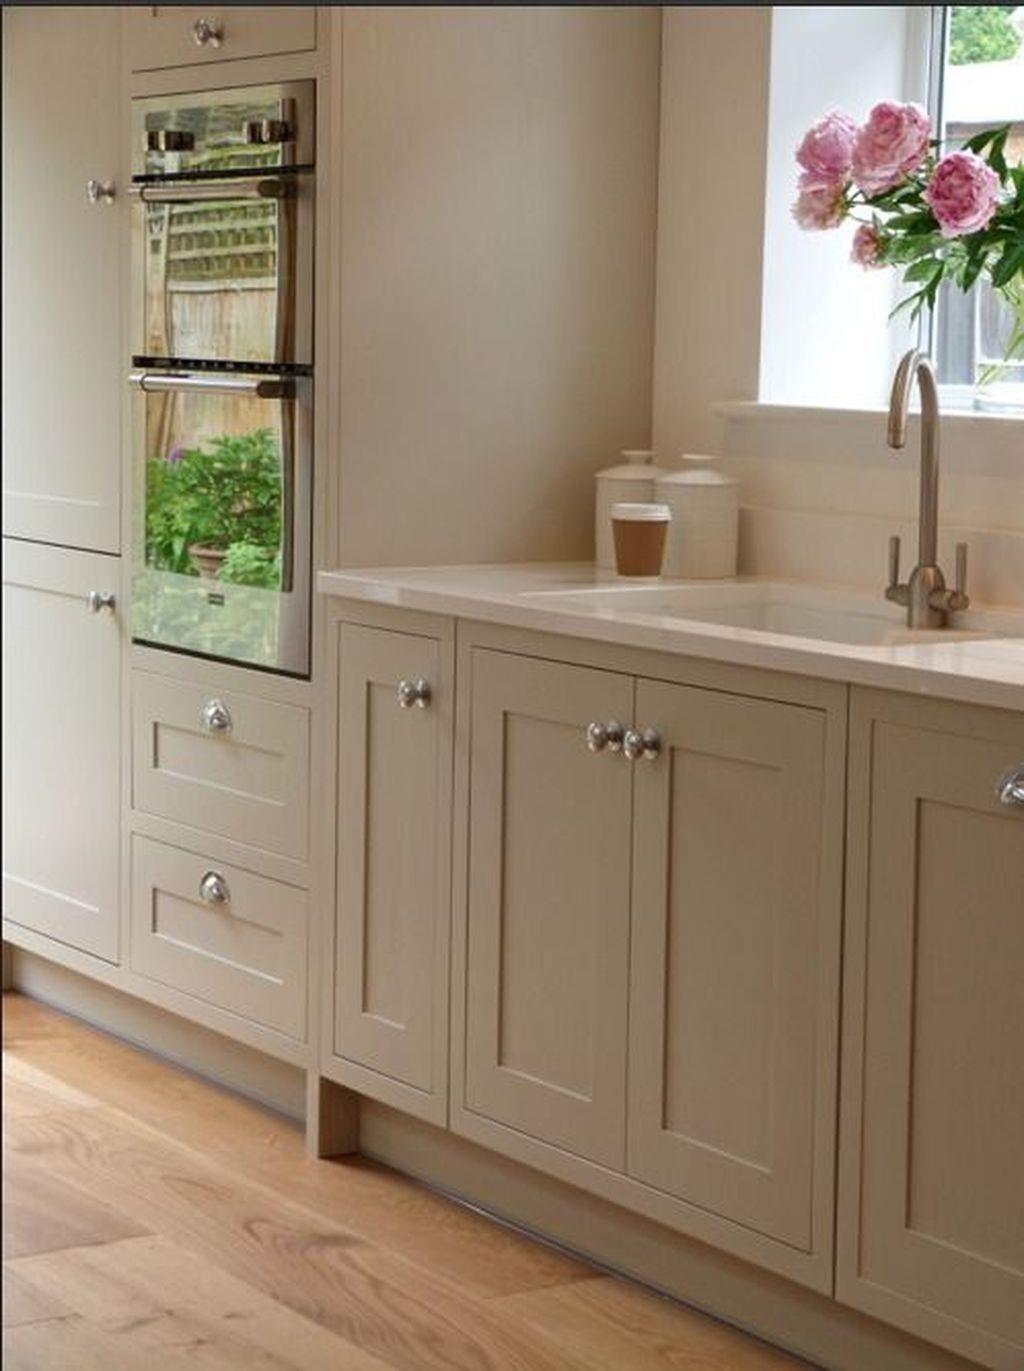 Elegant Kitchen Cupboard Anlamli Net In 2020 Kitchen Cupboard Handles Kitchen Door Handles Shaker Kitchen